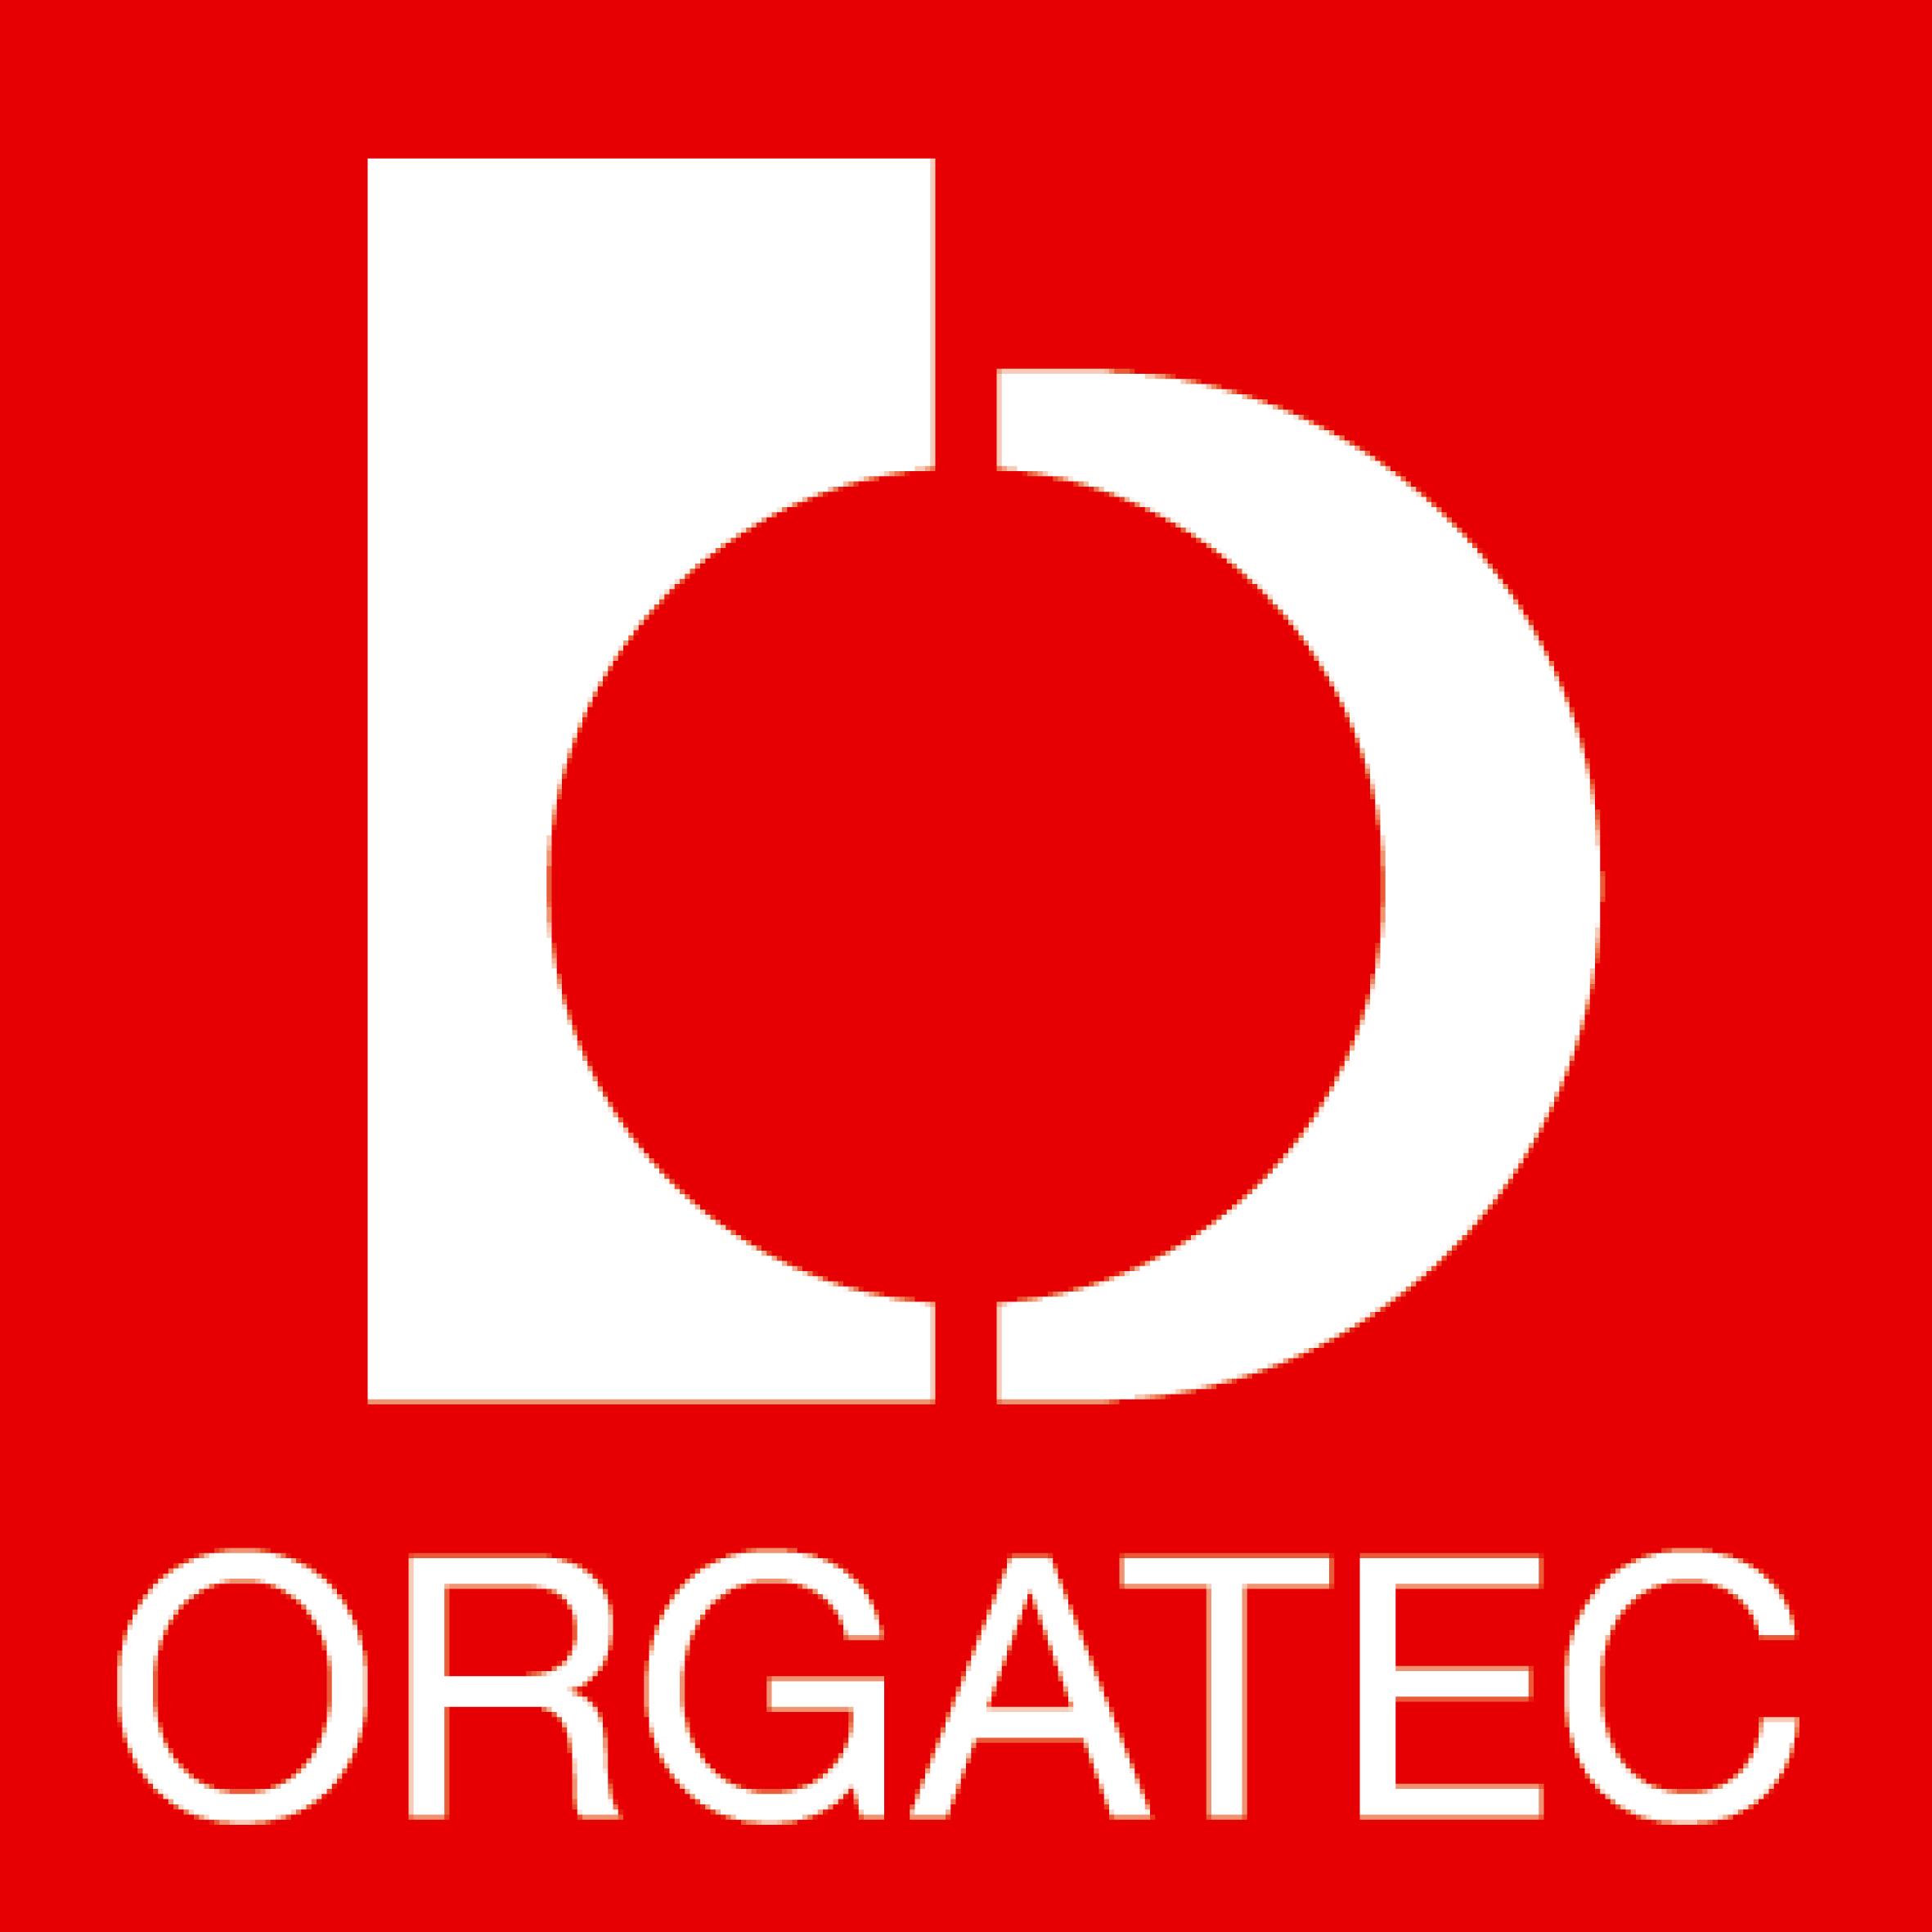 orgatec-logo_4c